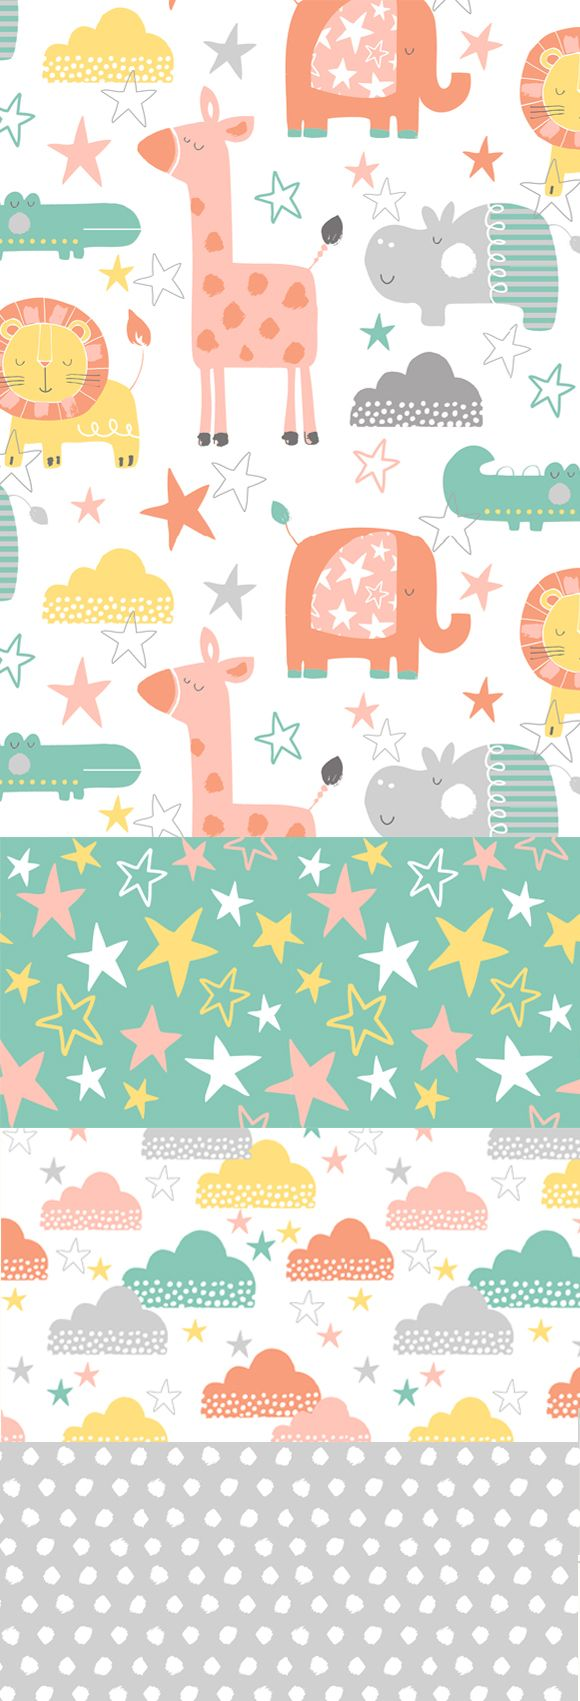 wendy kendall designs – freelance surface pattern designer » jungle stars